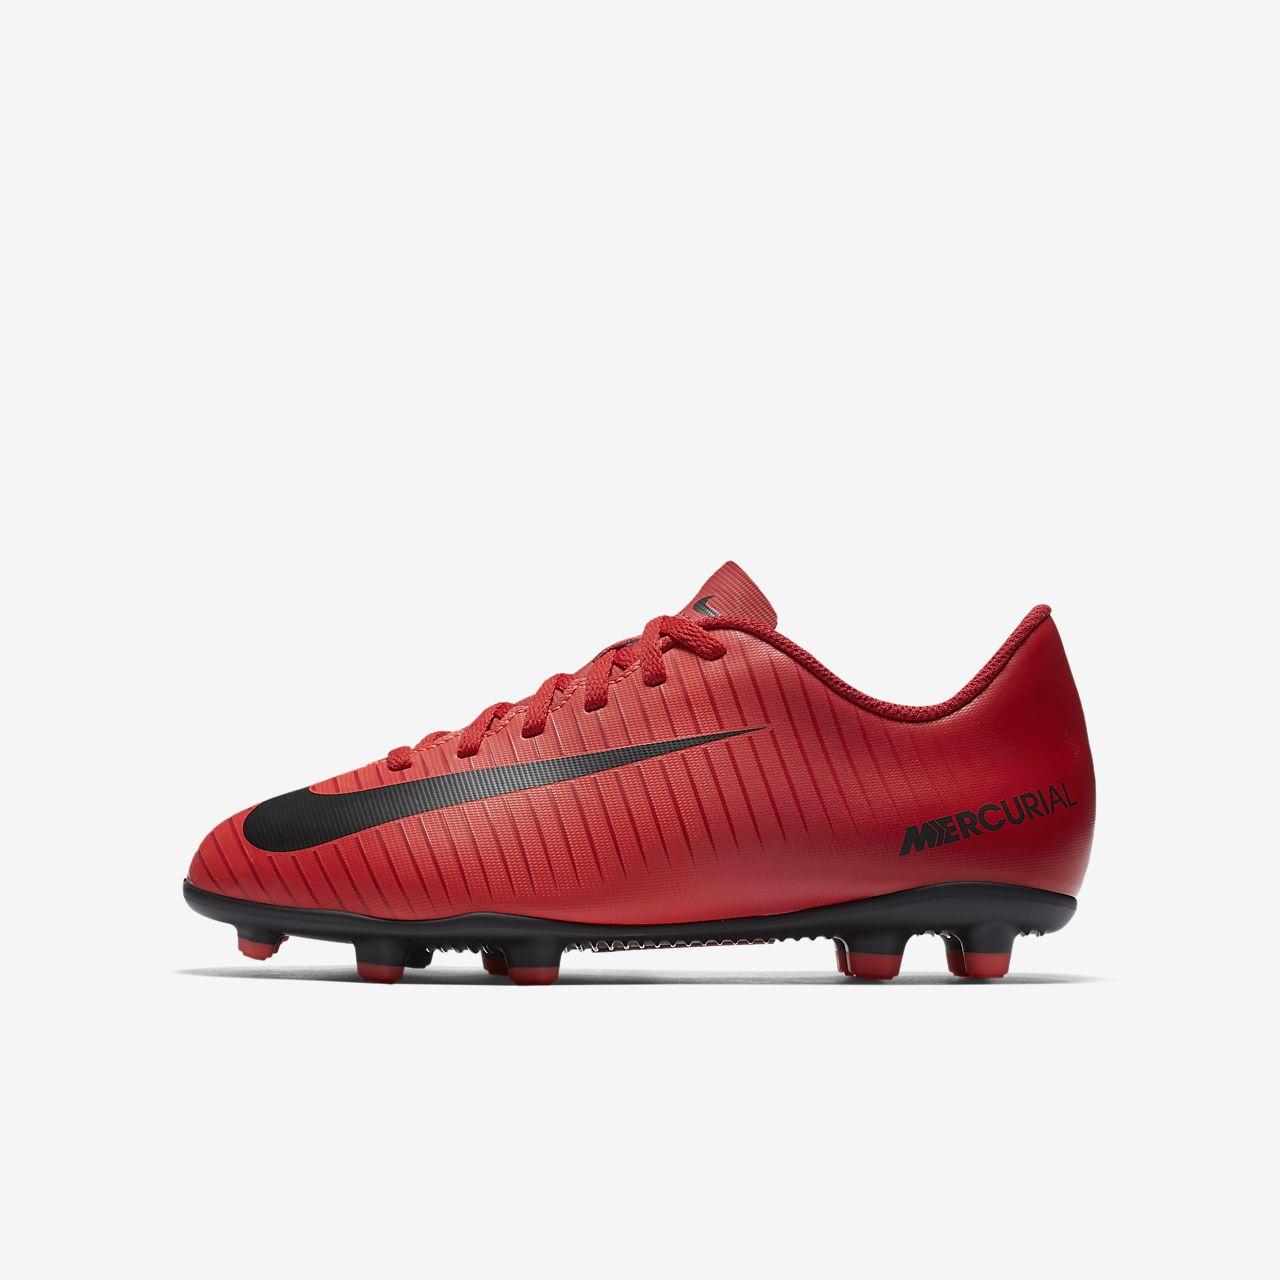 Scarpa da calcio per duri terreni duri per Nike Jr. Mercurial Vortex III Bambini Ragazzi 3ceaa3